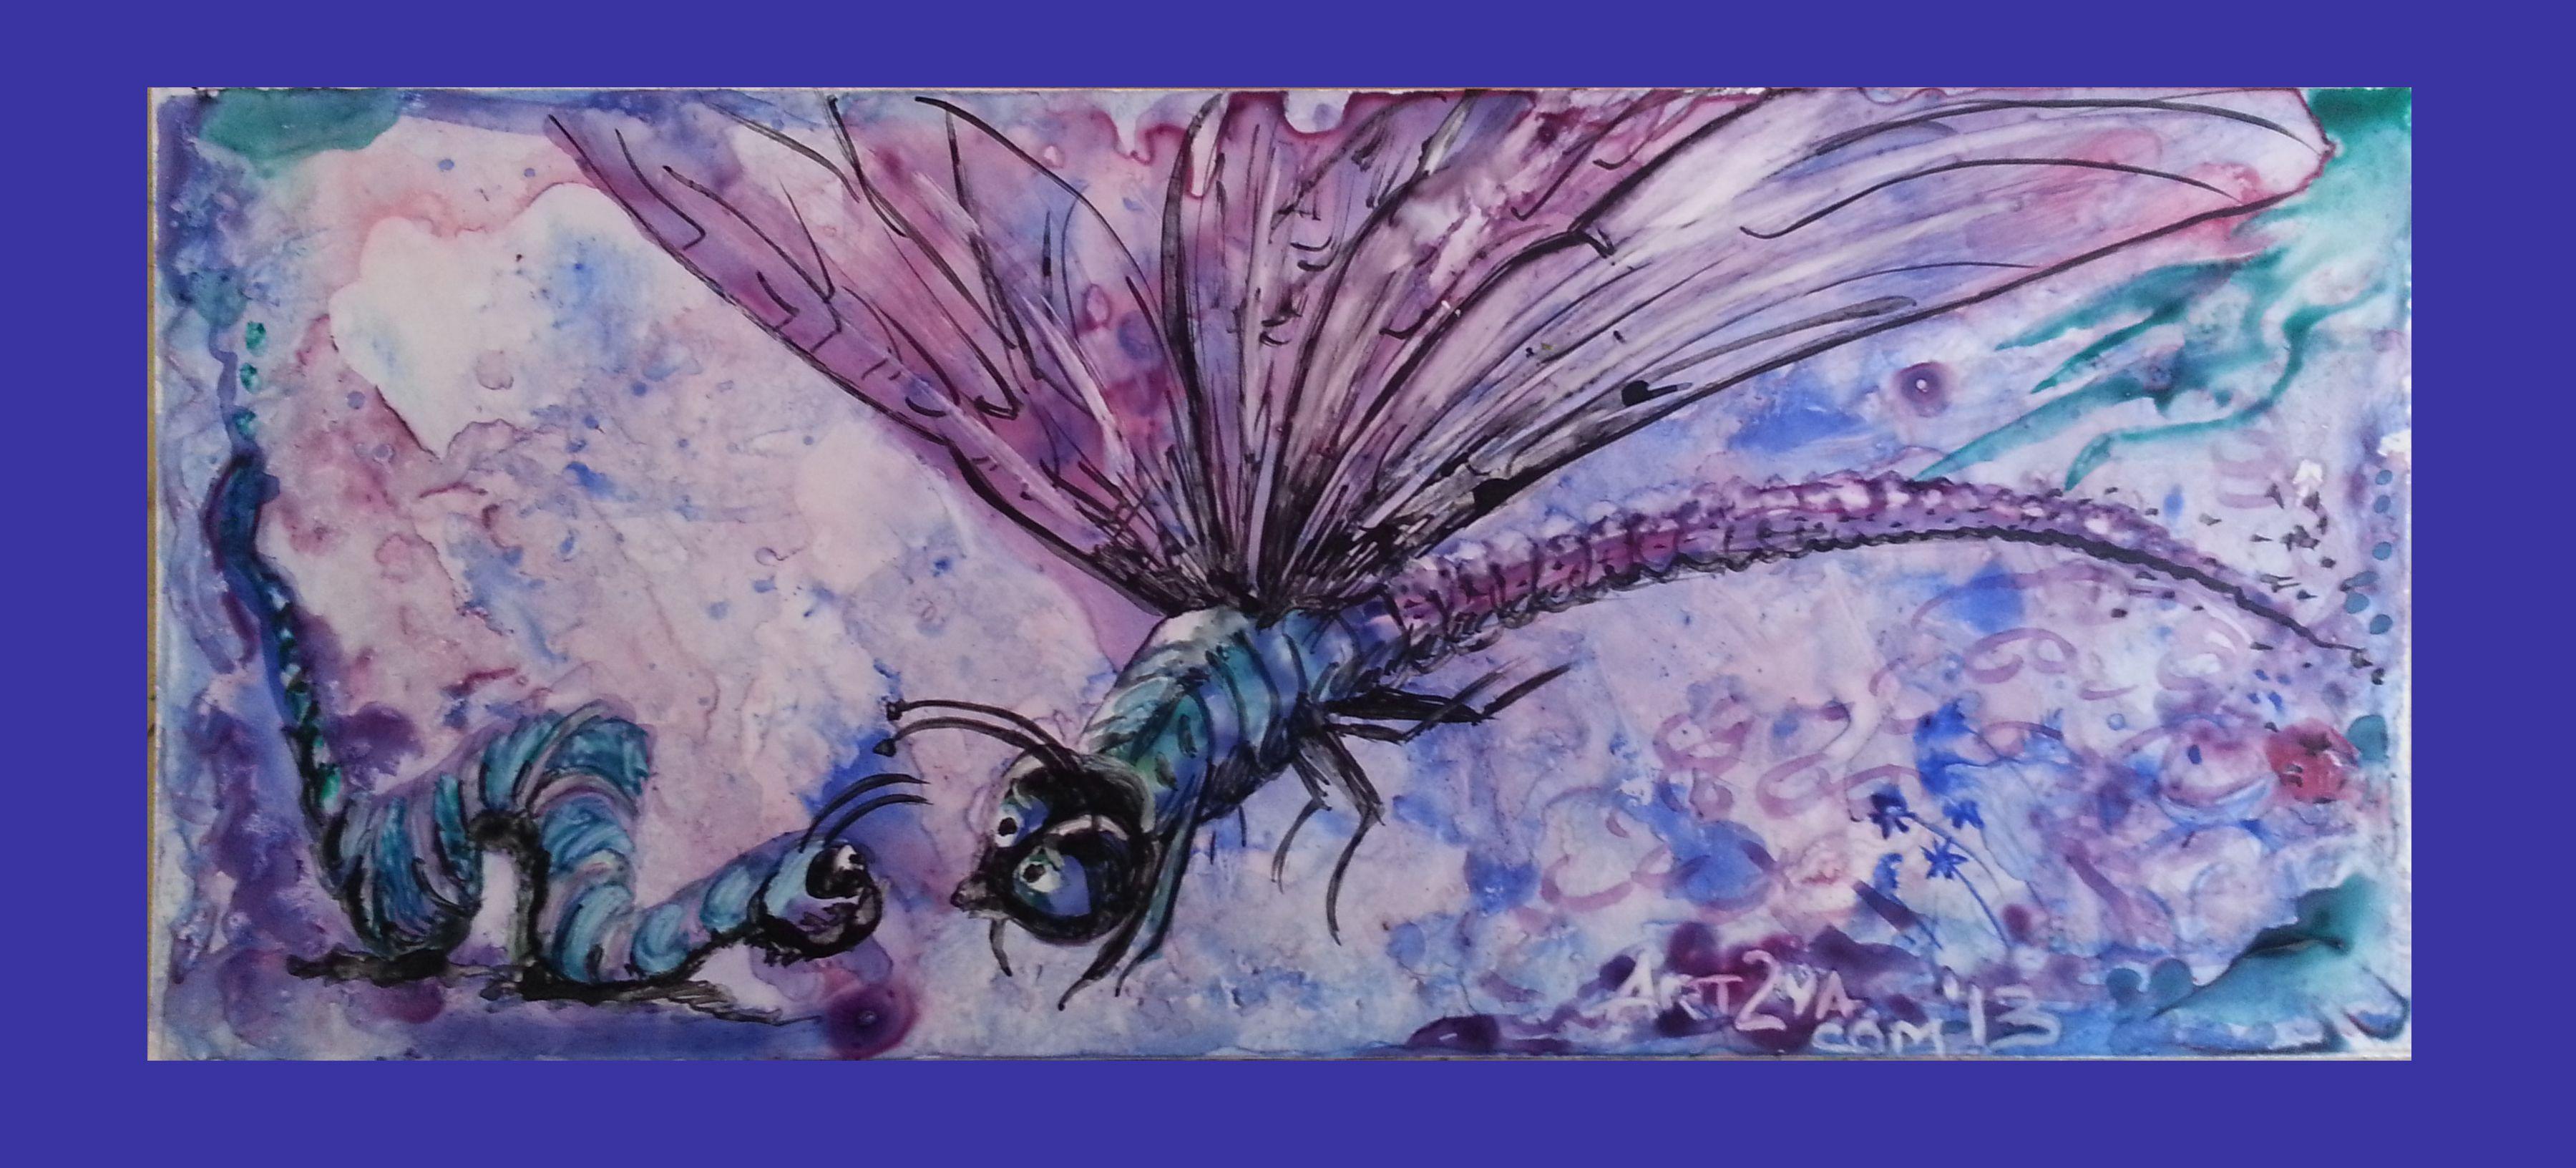 #4 Yupo Dragonfly meets Catterpillar